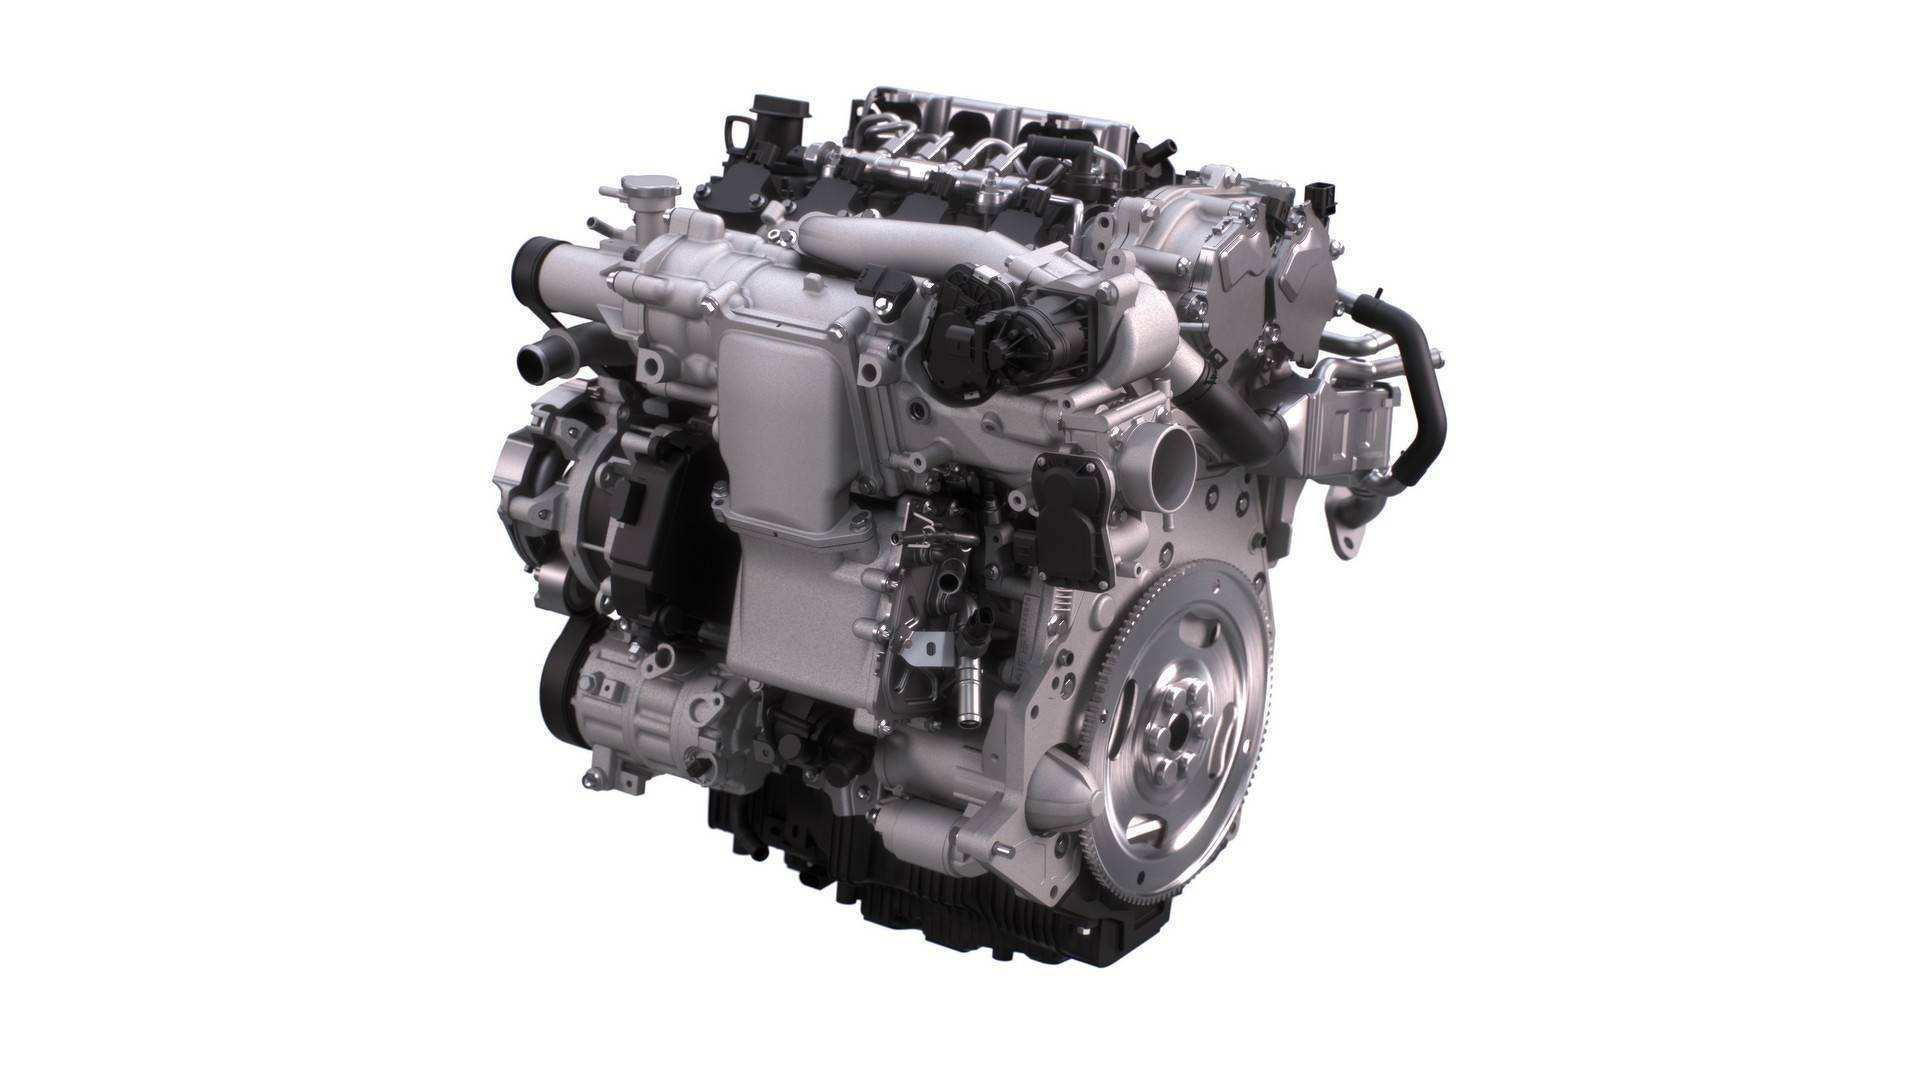 75 Gallery of Mazda 2019 Engine History for Mazda 2019 Engine